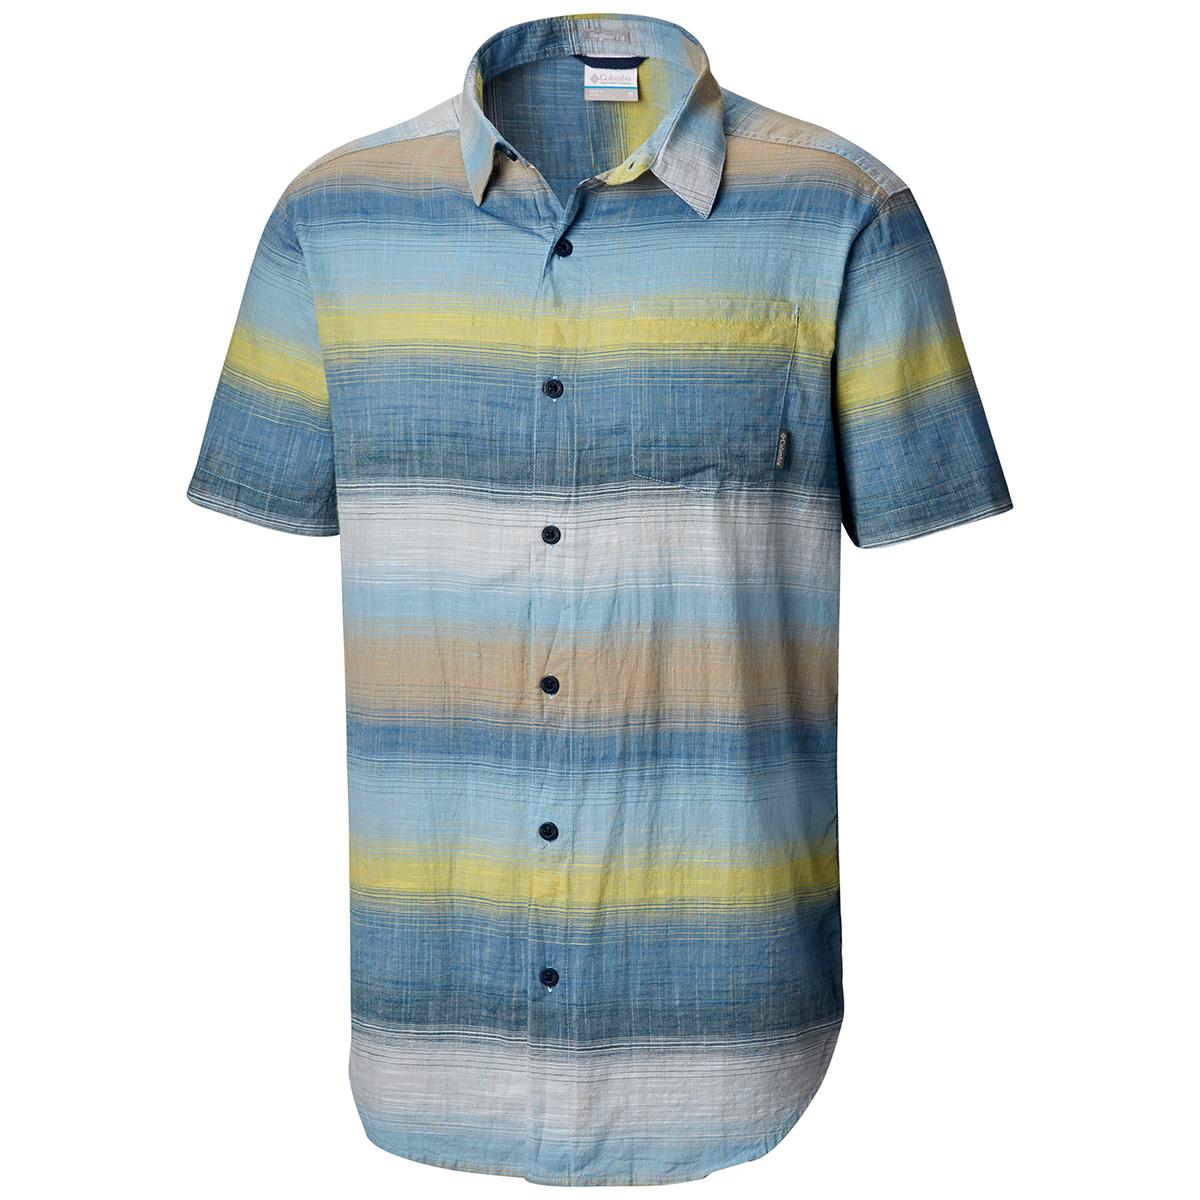 Columbia Men's Under Exposure Yarn-Dye Short Sleeve Shirt - Blue, M